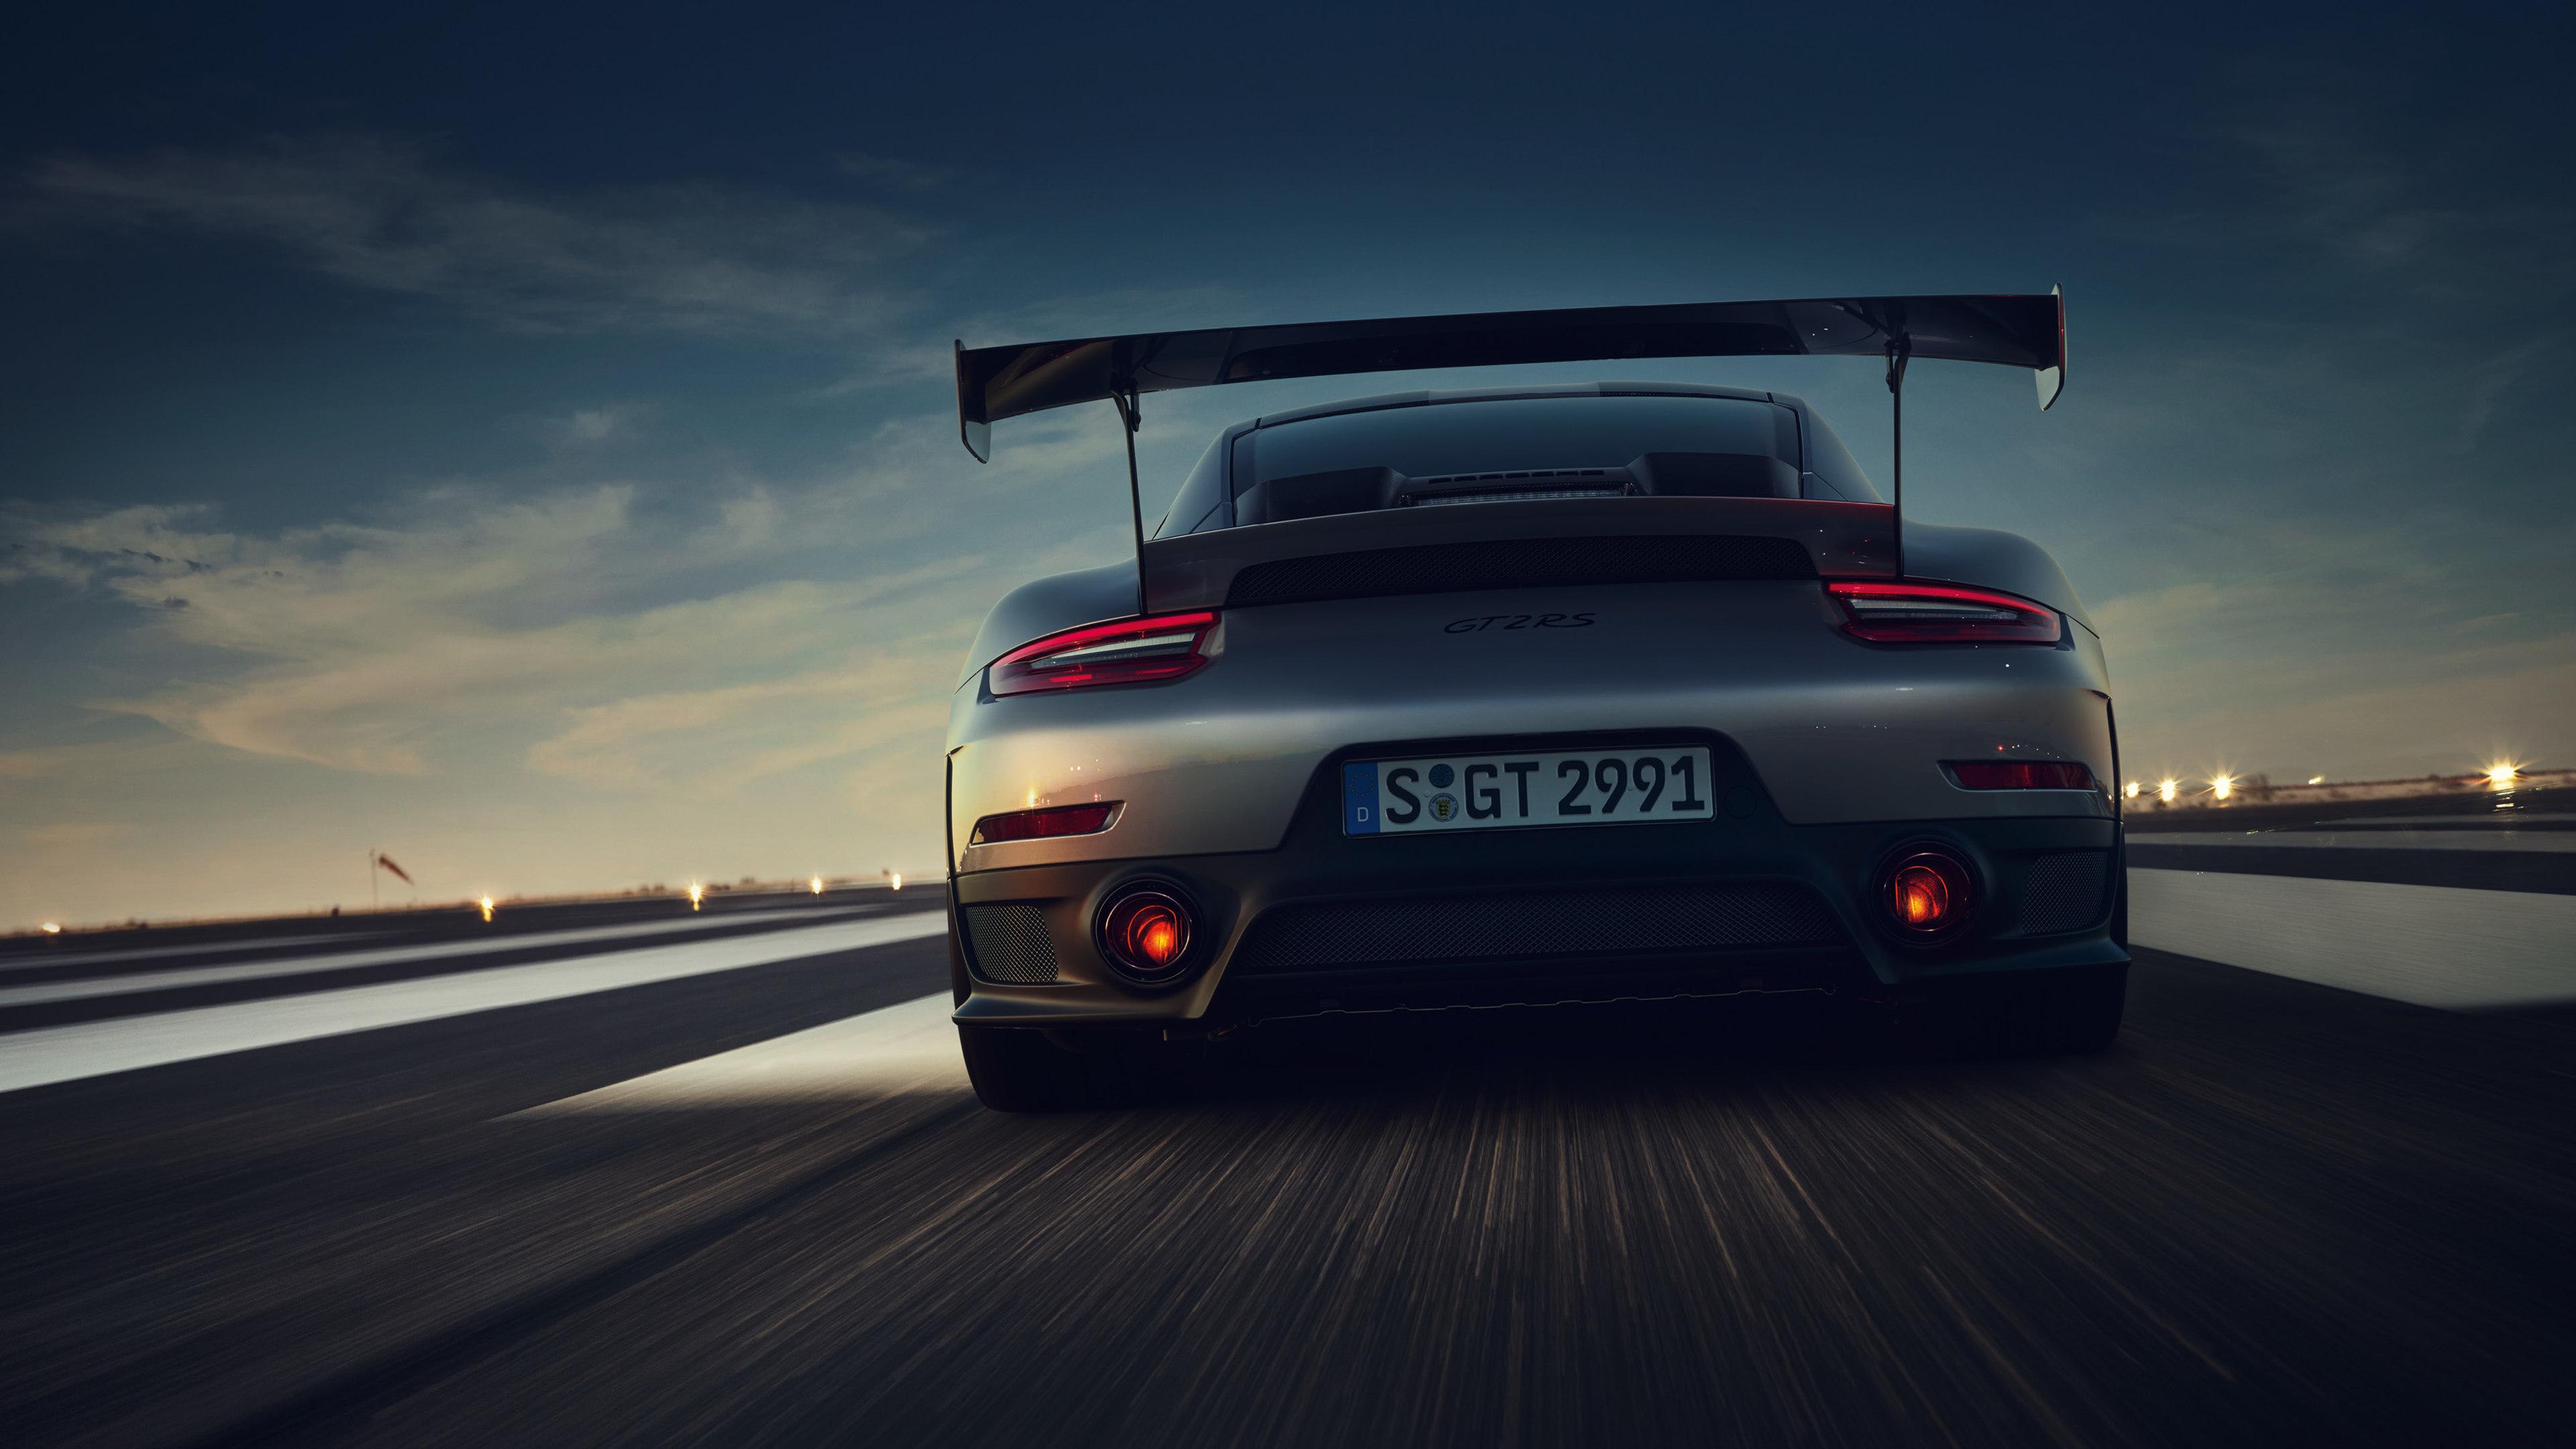 2018 porsche 911 gt2rs 1539108591 - 2018 Porsche 911 GT2RS - porsche wallpapers, porsche 911 wallpapers, hd-wallpapers, cars wallpapers, behance wallpapers, 4k-wallpapers, 2018 cars wallpapers